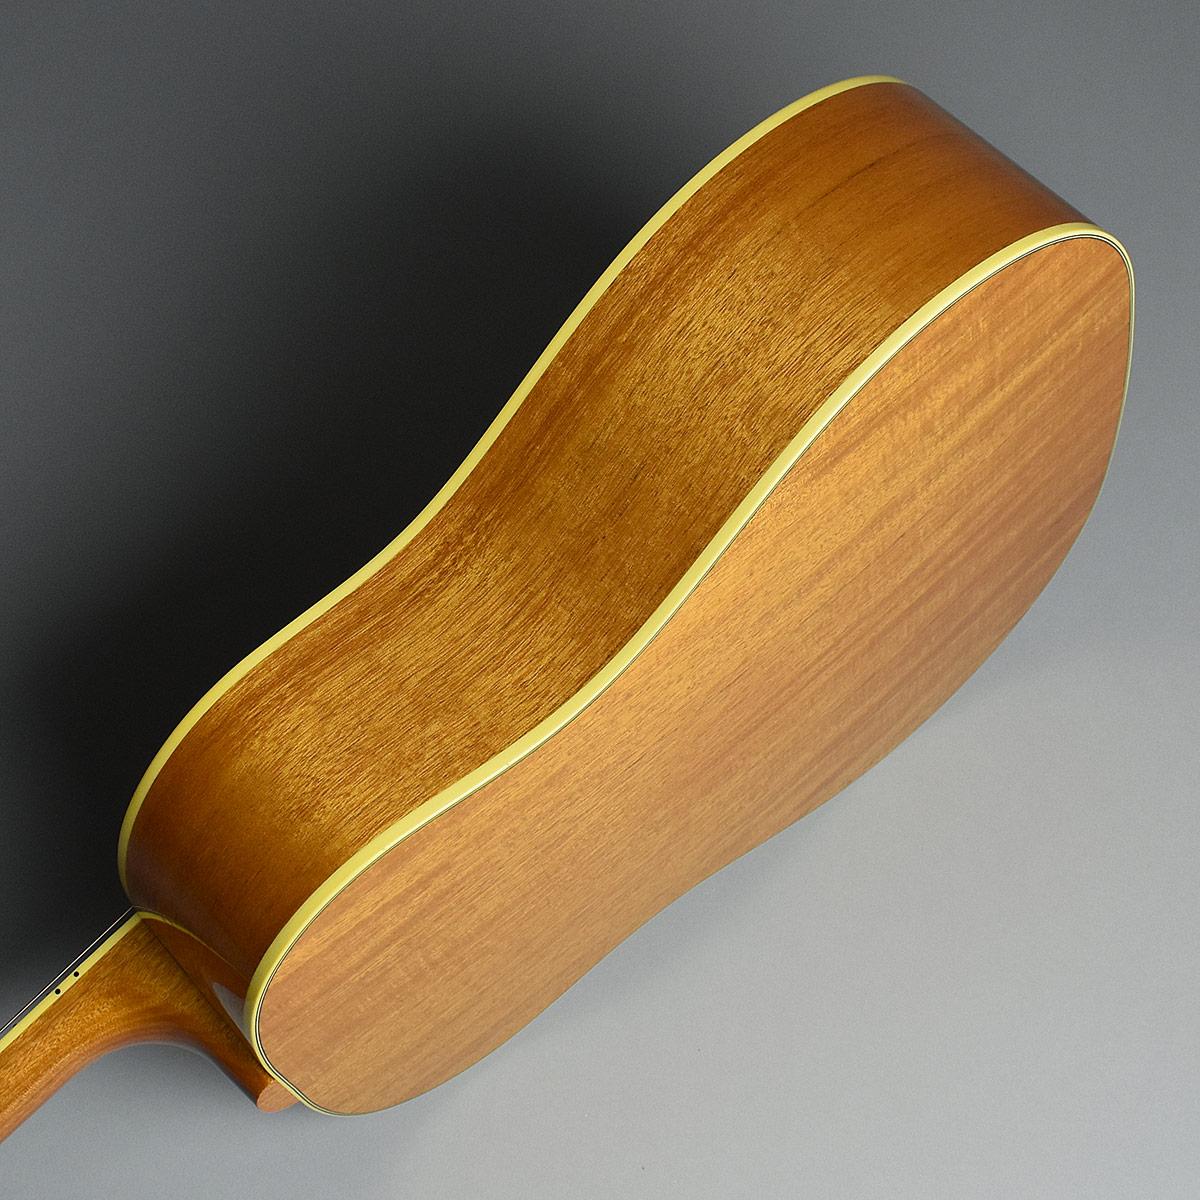 GibsonSOUTHERNJUMBOTripleAntiqueNaturalS/N:12416018アコースティックギター【ギブソン】【数量限定特典ギグバック付属】【未展示品】